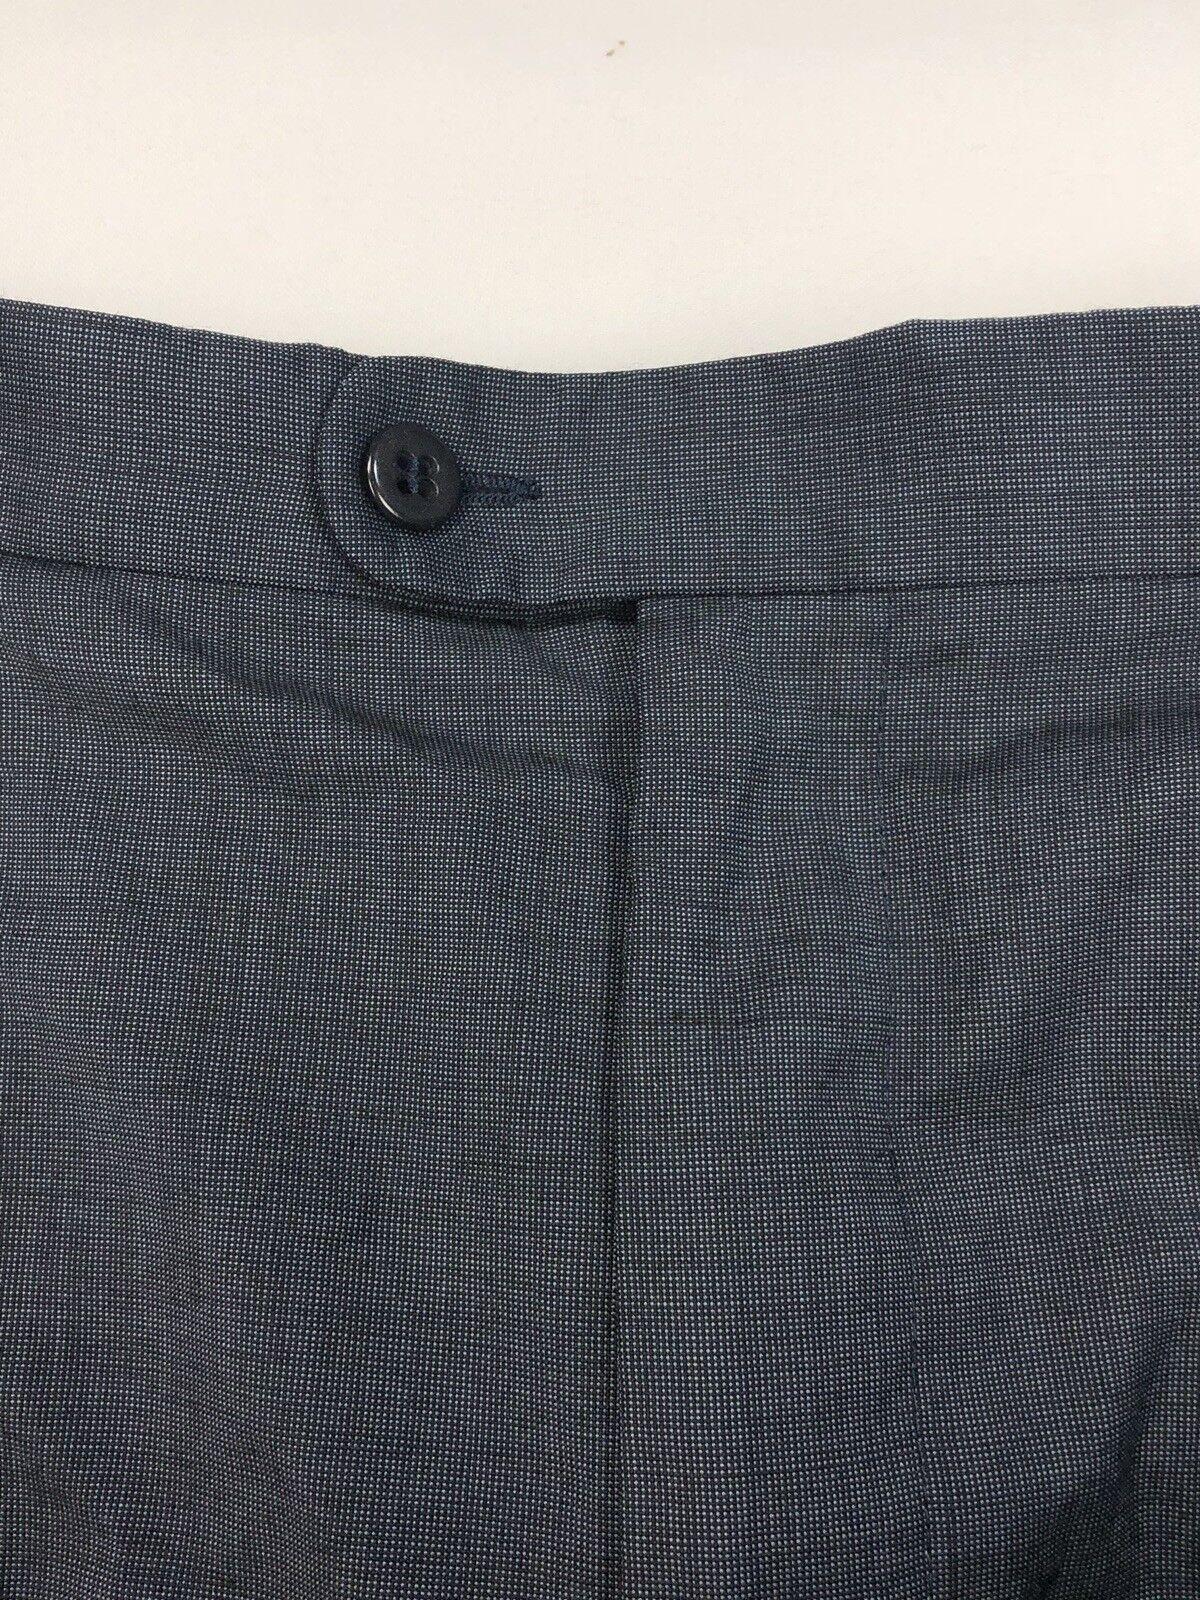 Zanella Bennett Dark bluee Front Pleat Mem Dress Pants Sz 34 X 28